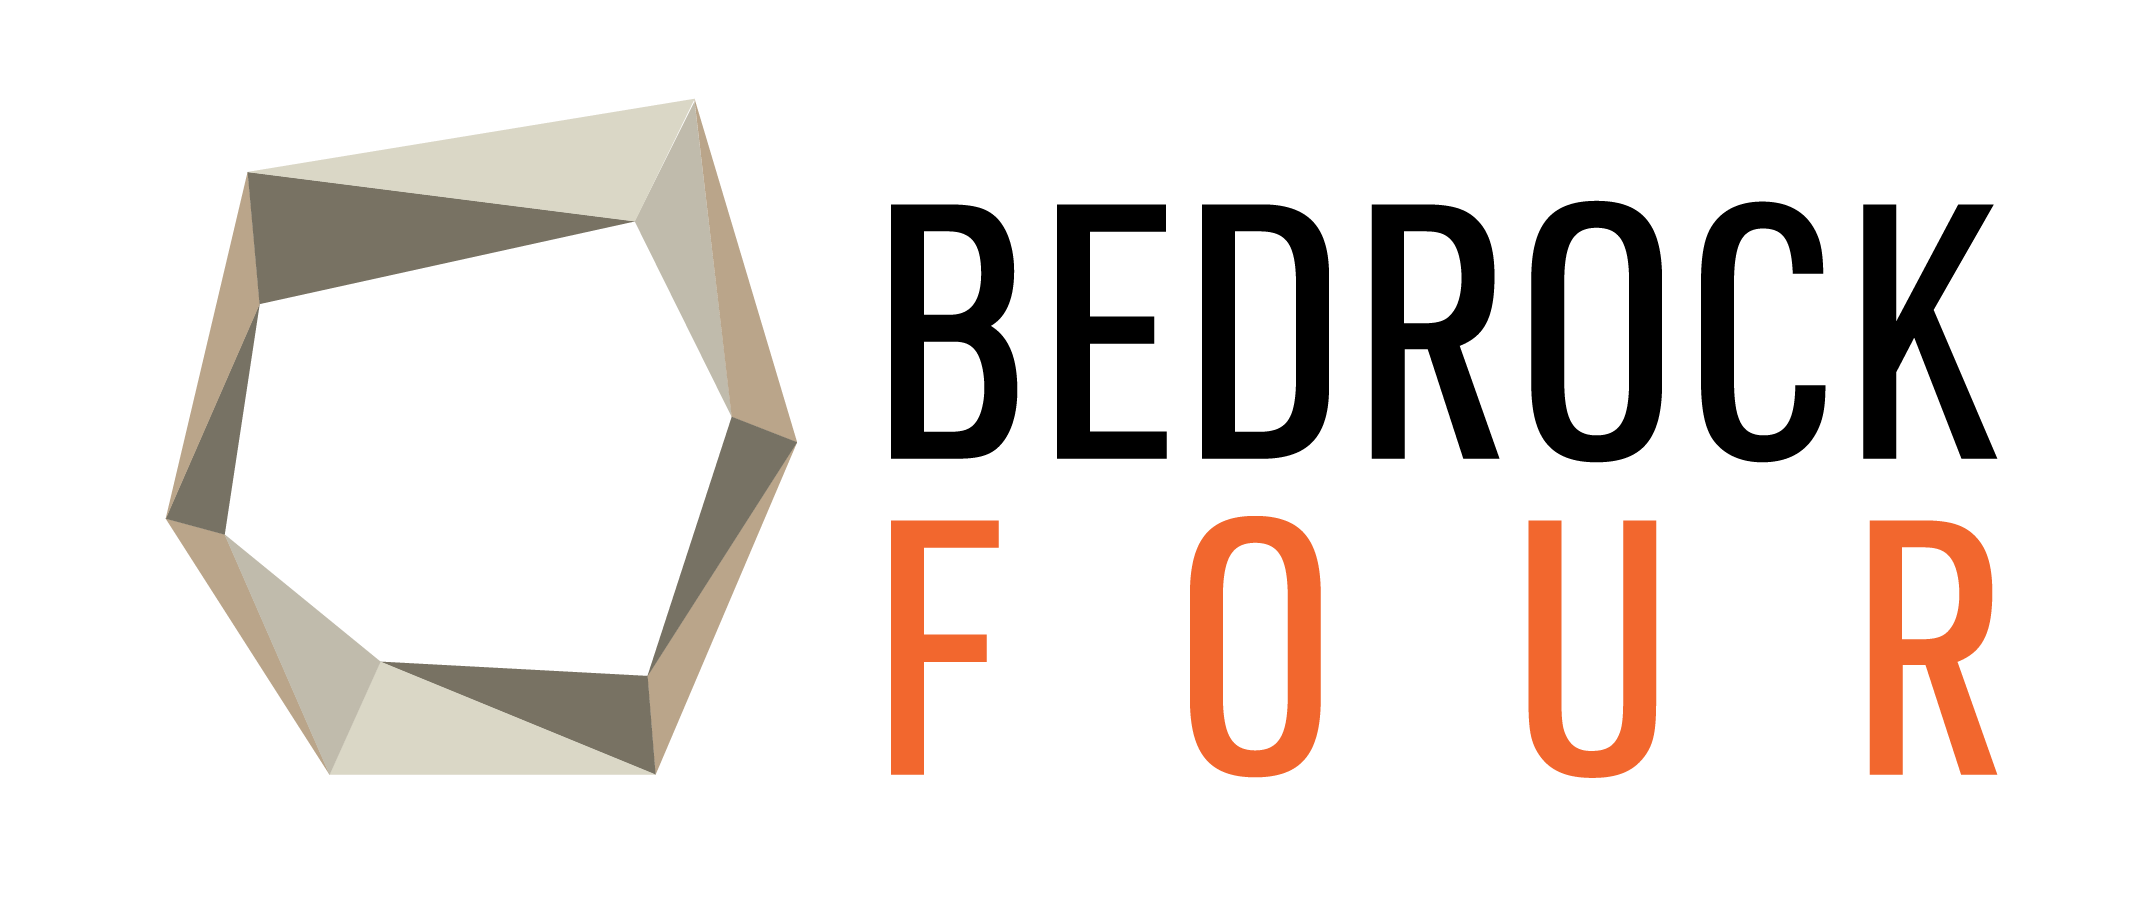 Bedrock FOUR logo 2019_Orange.png